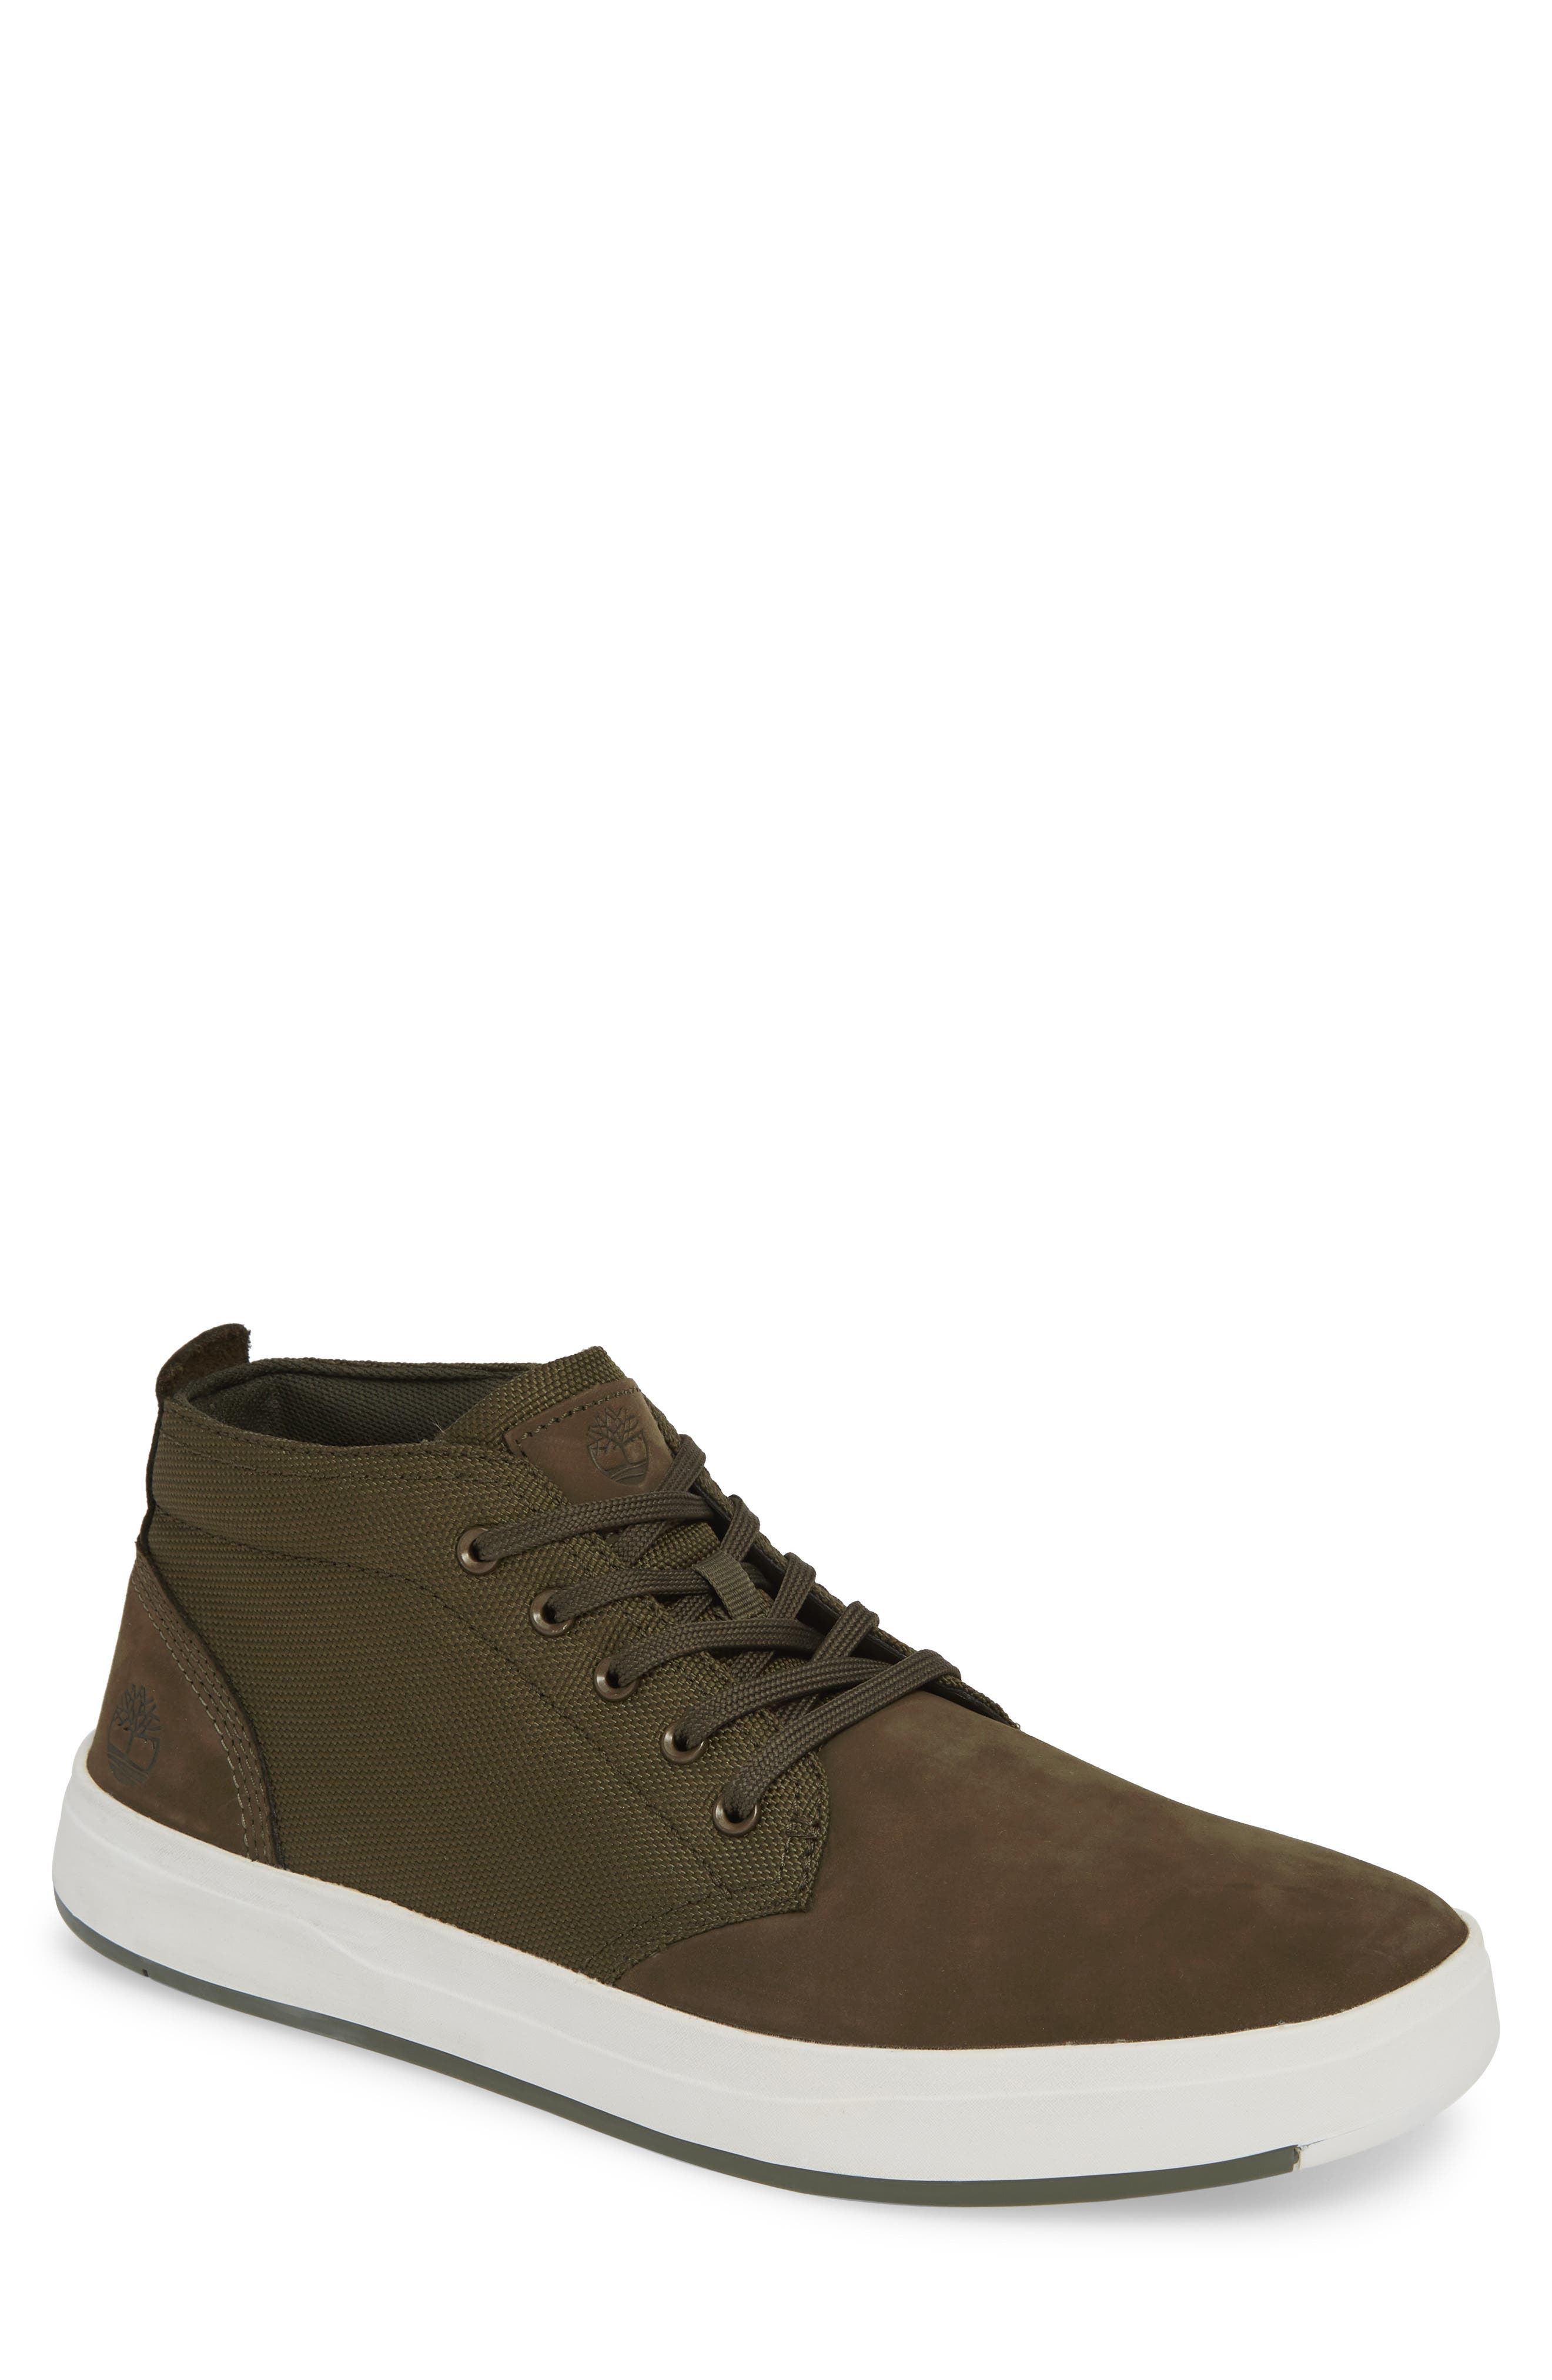 TIMBERLAND, Davis Square Mid Top Sneaker, Main thumbnail 1, color, DARK GREEN NUBUCK